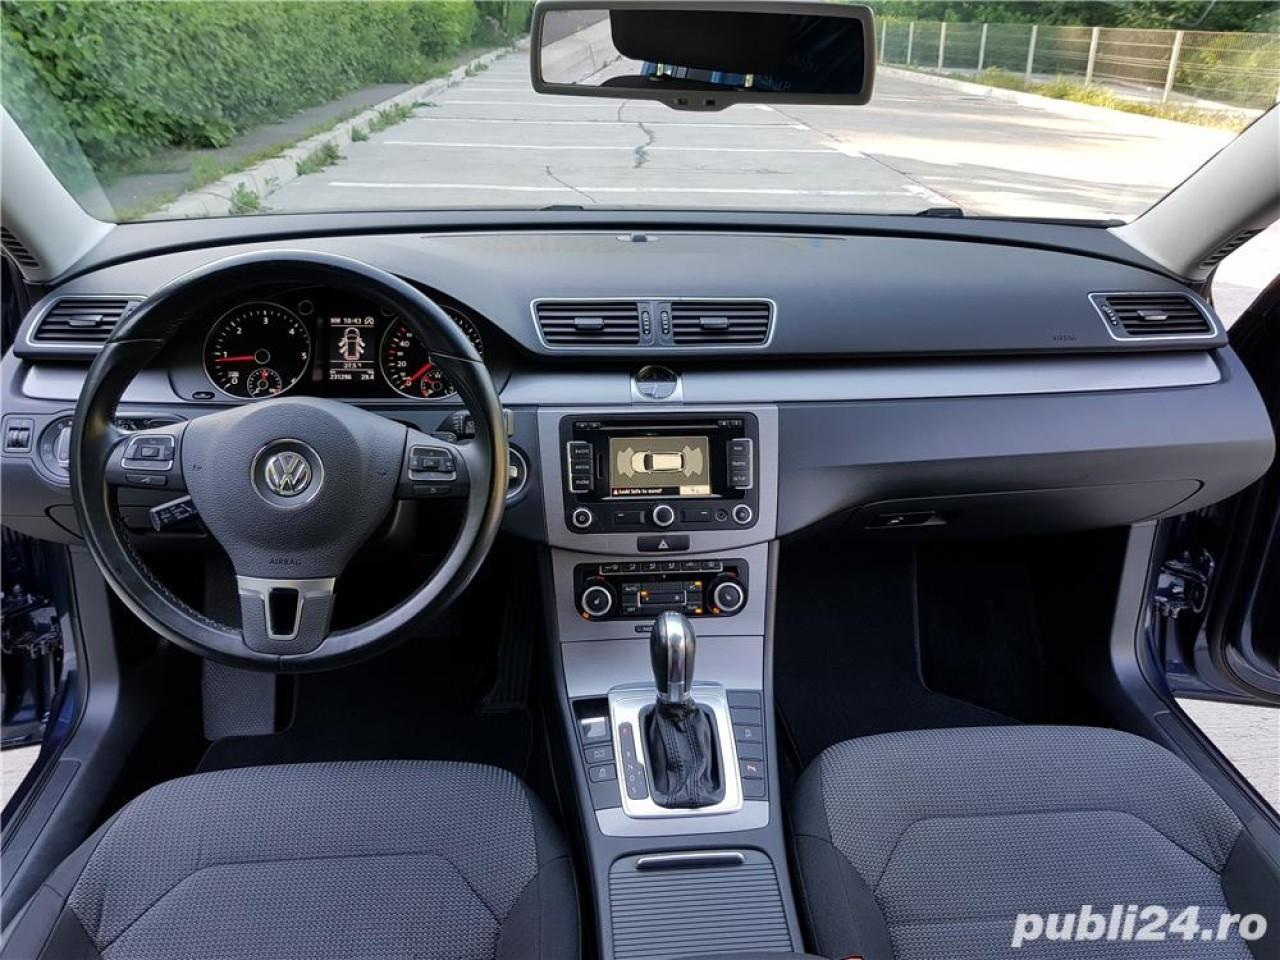 VW Passat 2.0 TDI 2012